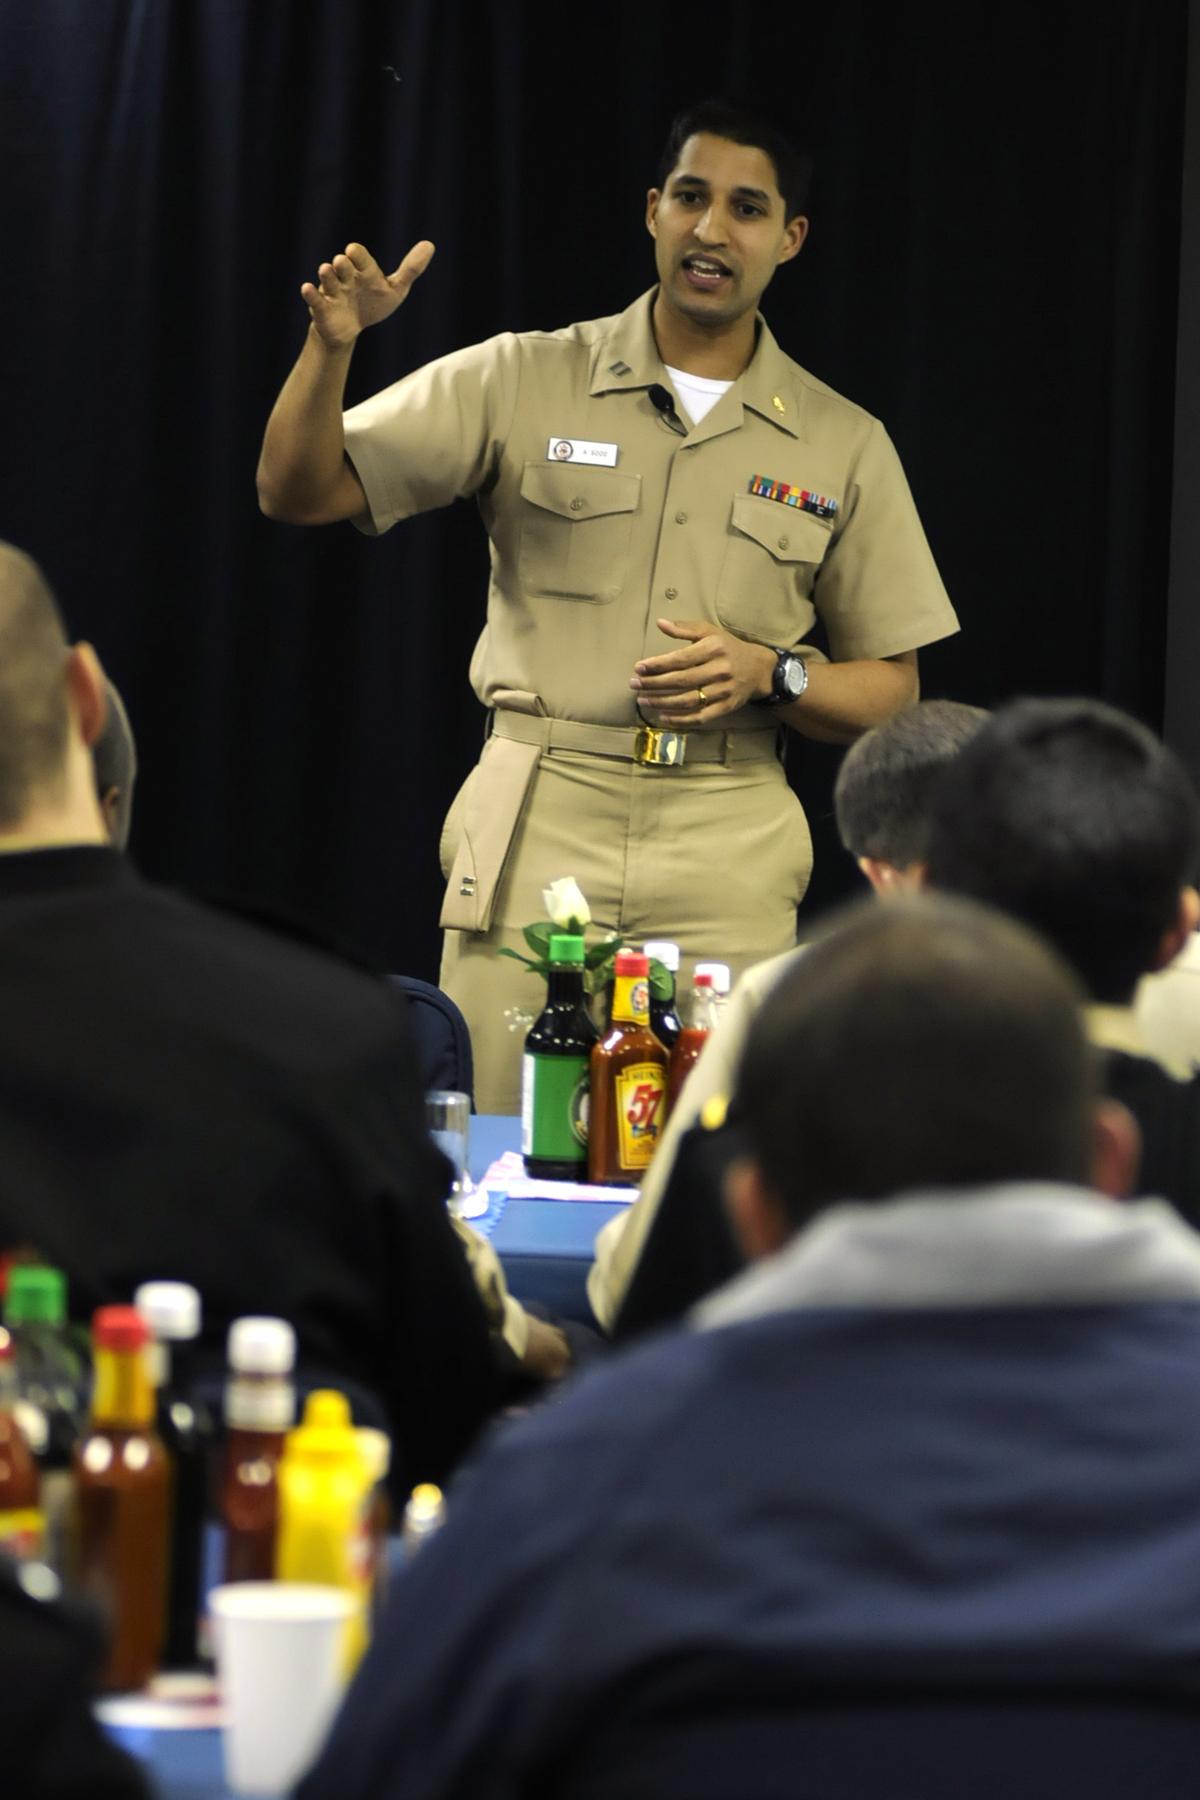 File:US Navy 081114-N-8546L-198 Lt  Amit Sood, a clinical